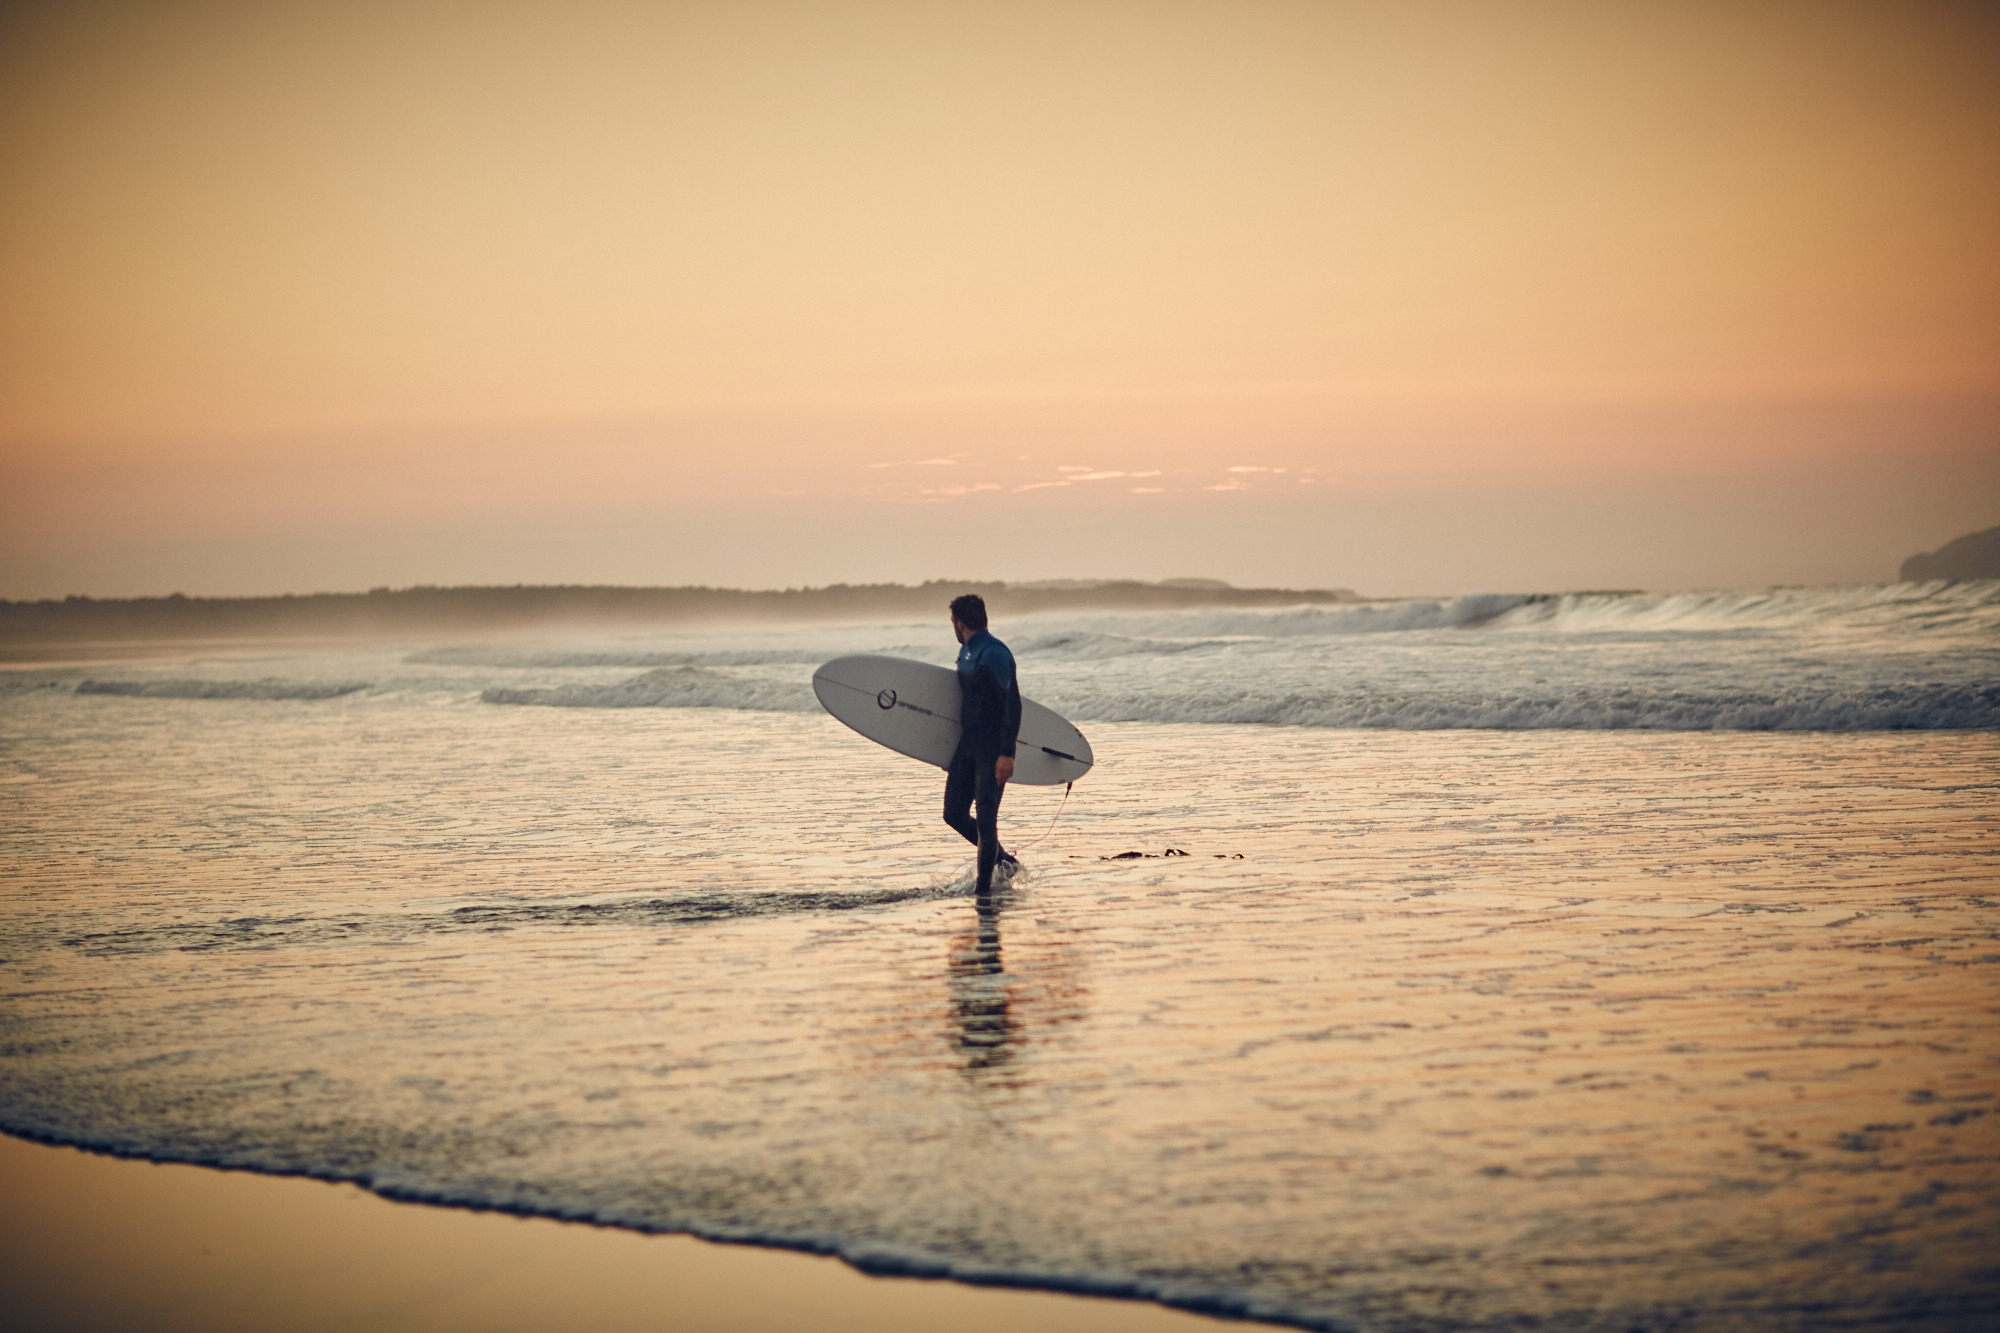 surf lyfestyle 1802.jpg